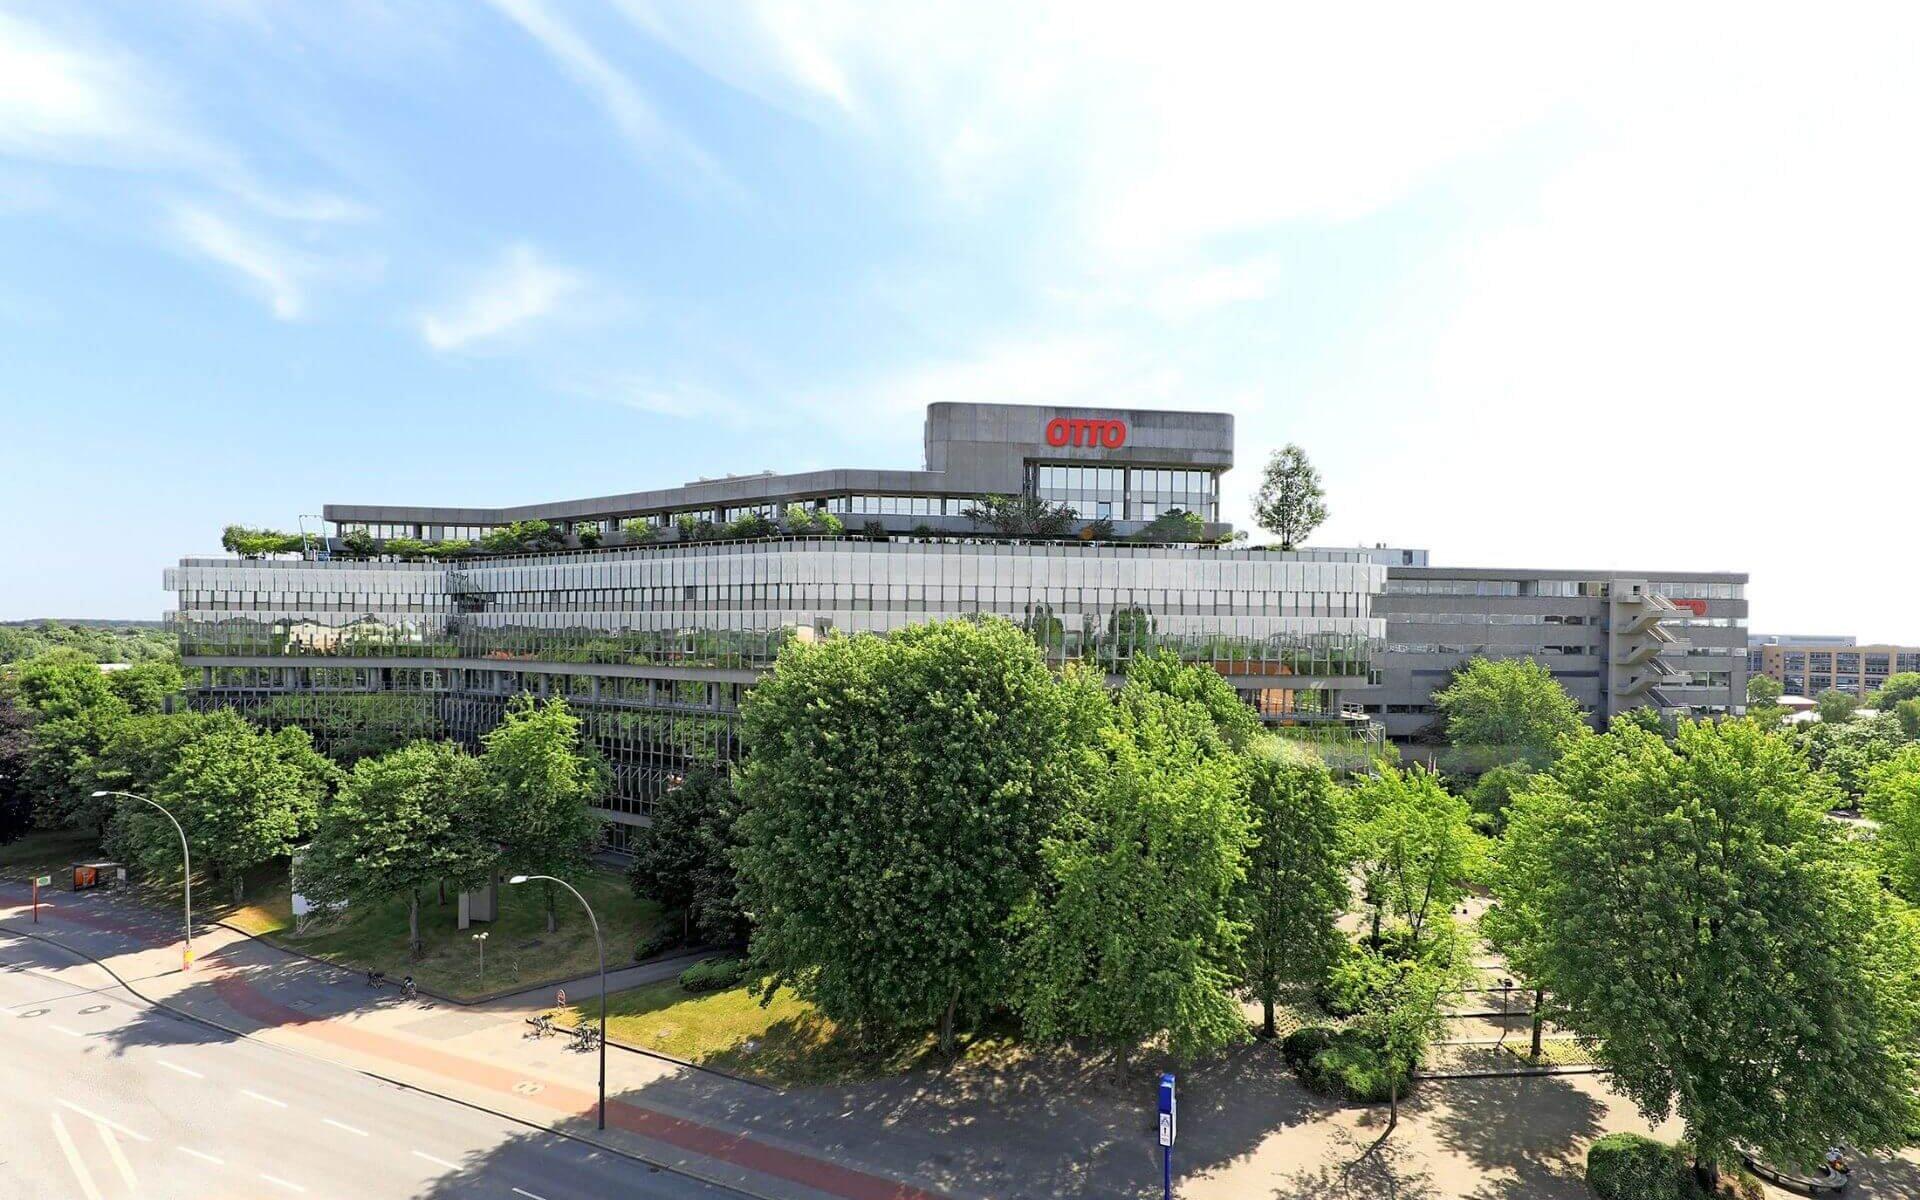 Otto Campus Zentrale